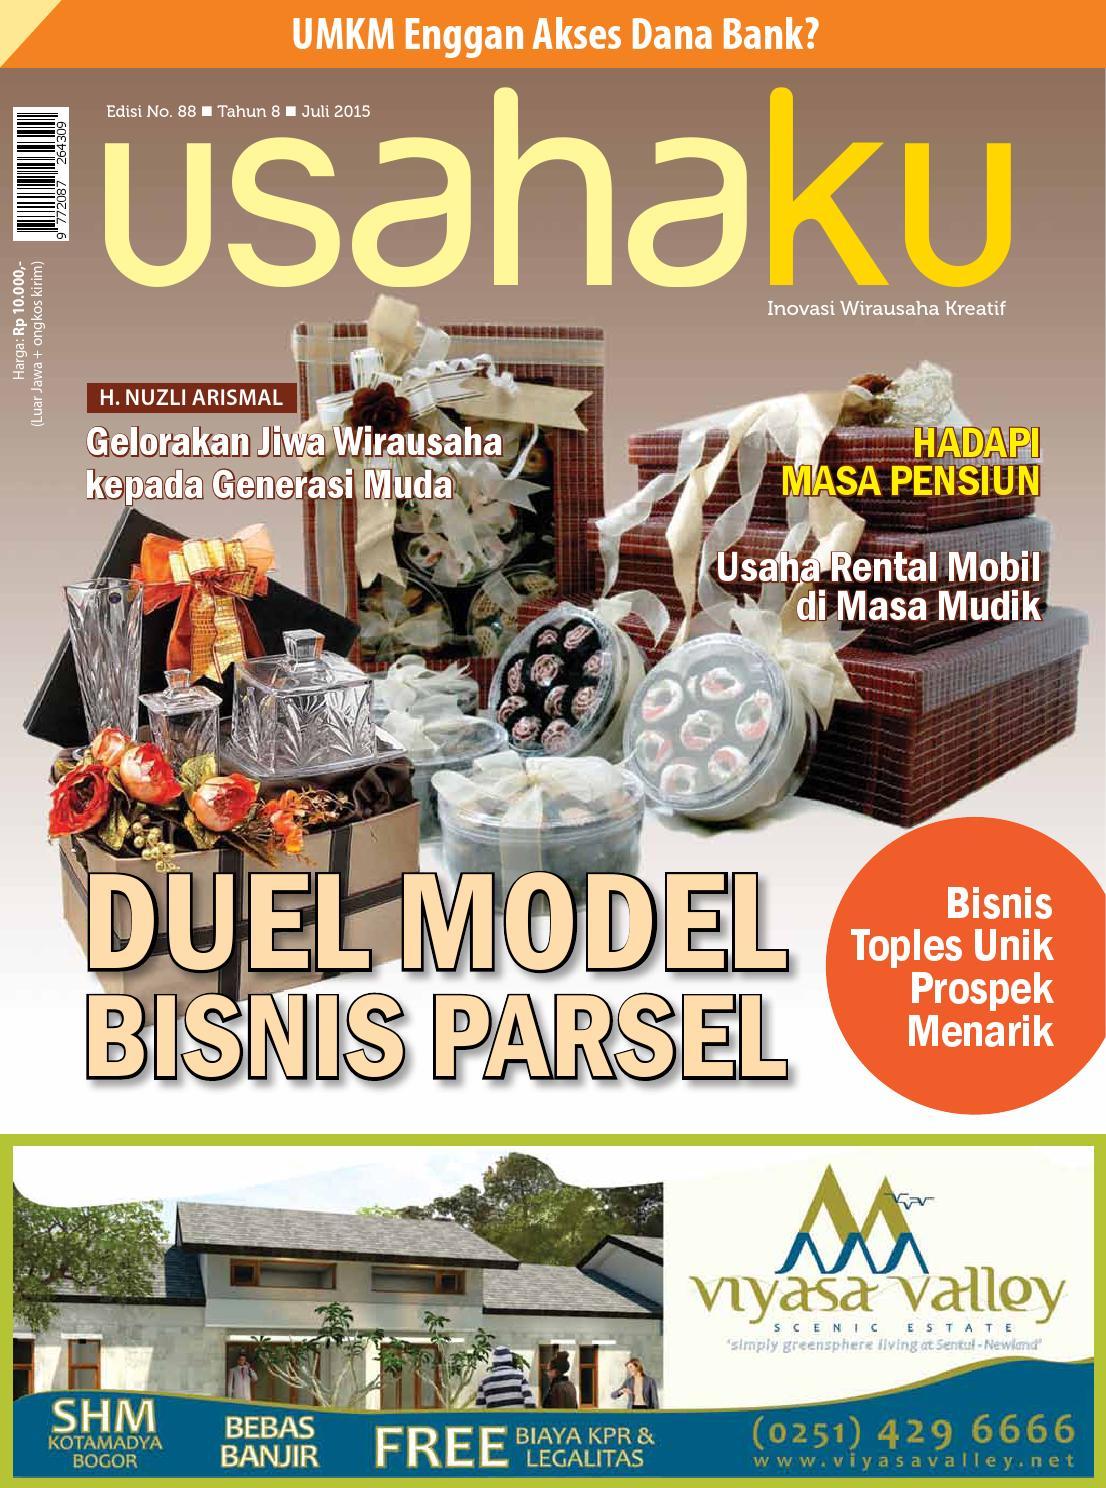 Tabloid Usahaku Juli 2015 By Issuu Produk Ukm Bumn Kain Batik Handmade Warna Alam